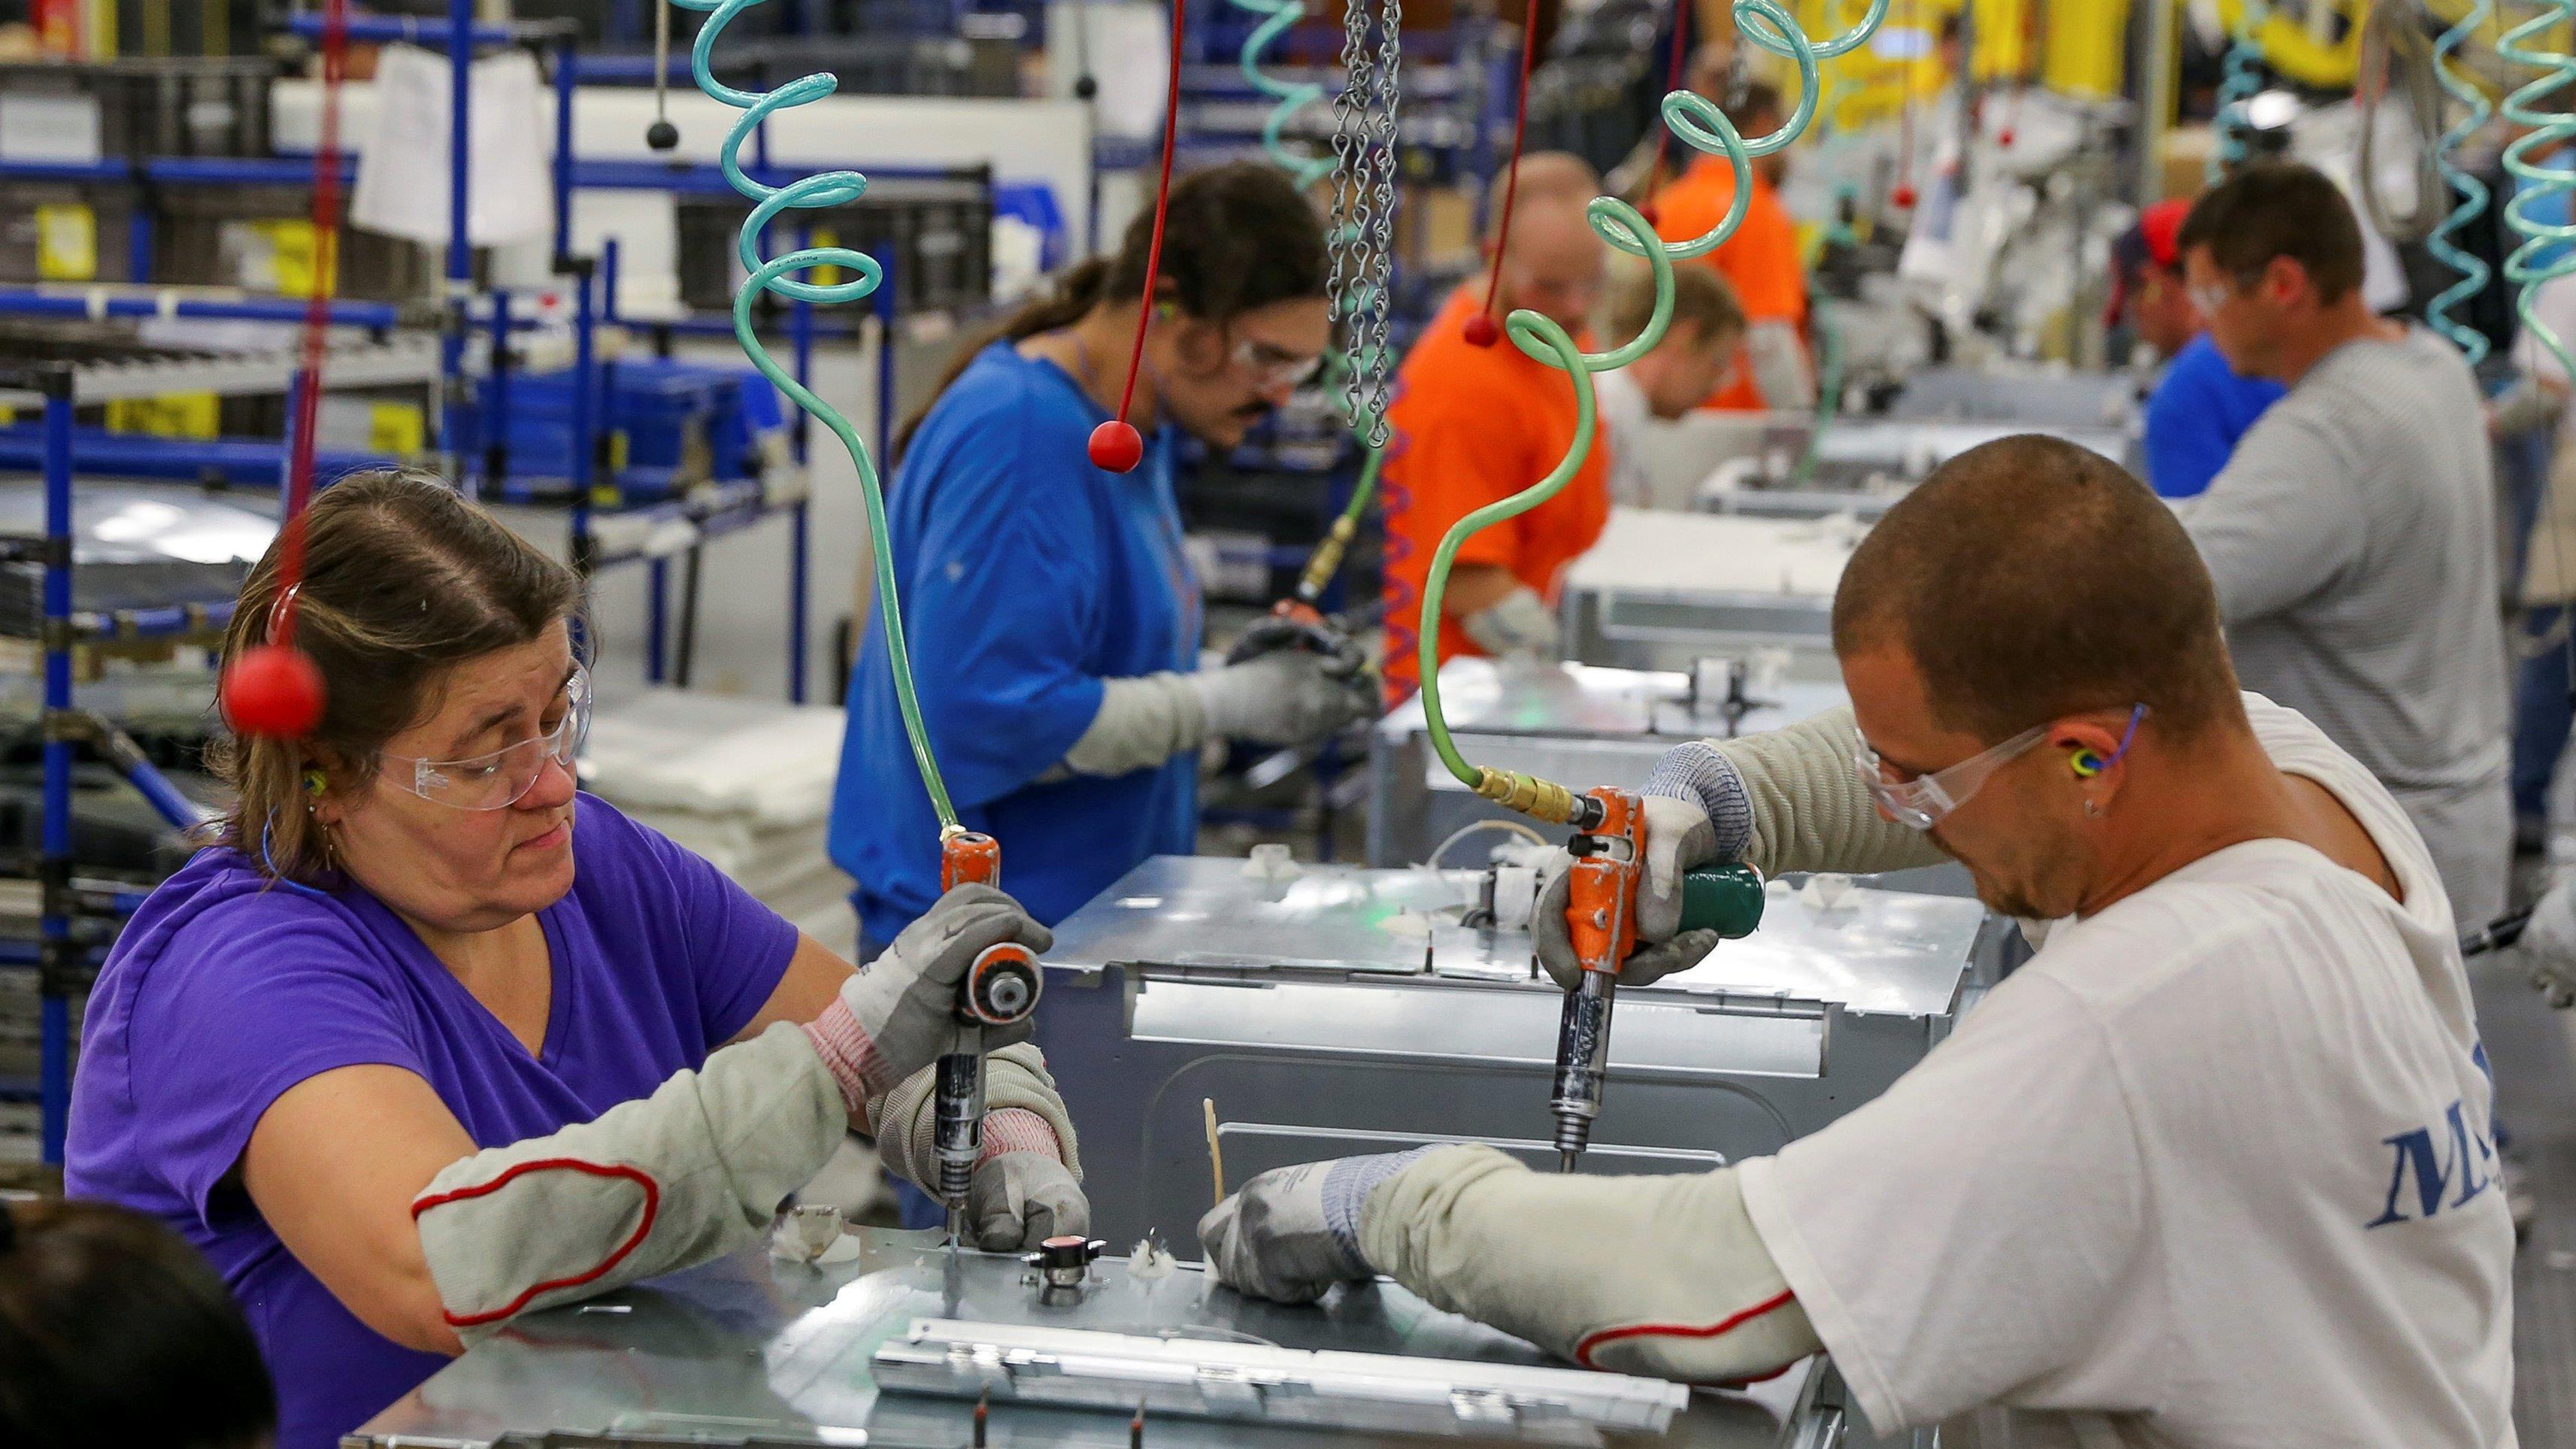 U.S. economy grows 0.5 percent in 1Q